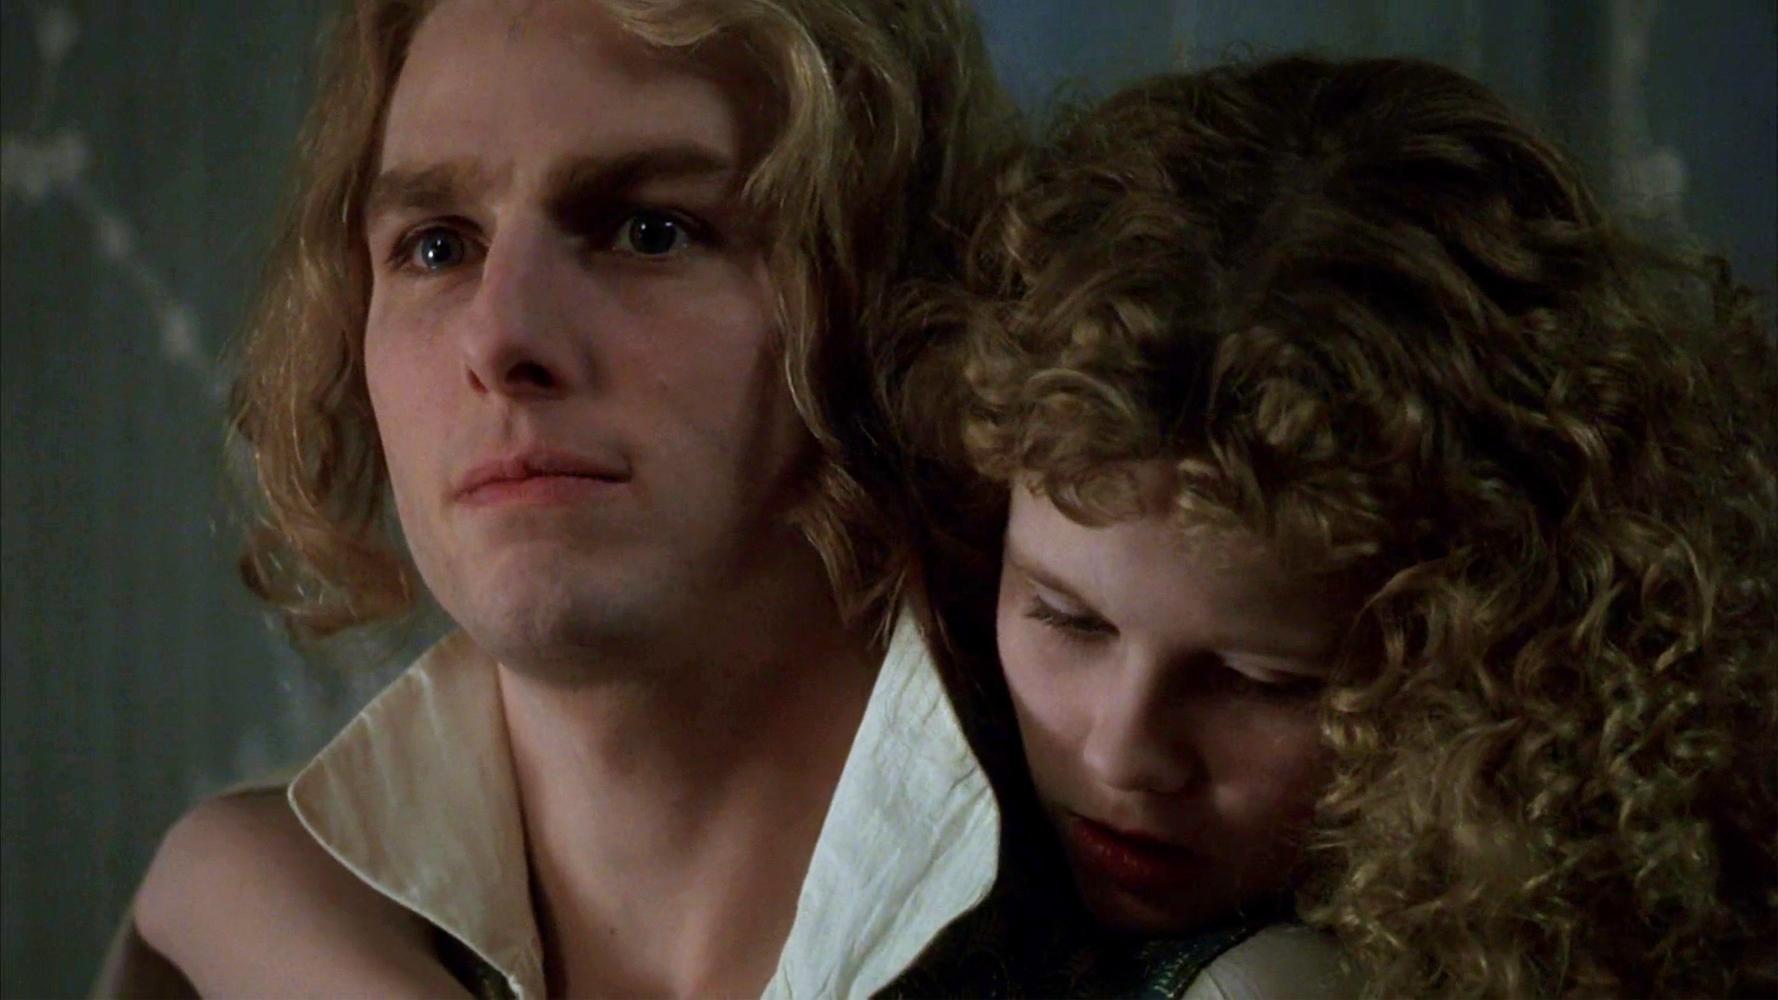 Lestat de Lioncourt | The Vampire Chronicles Wiki | FANDOM